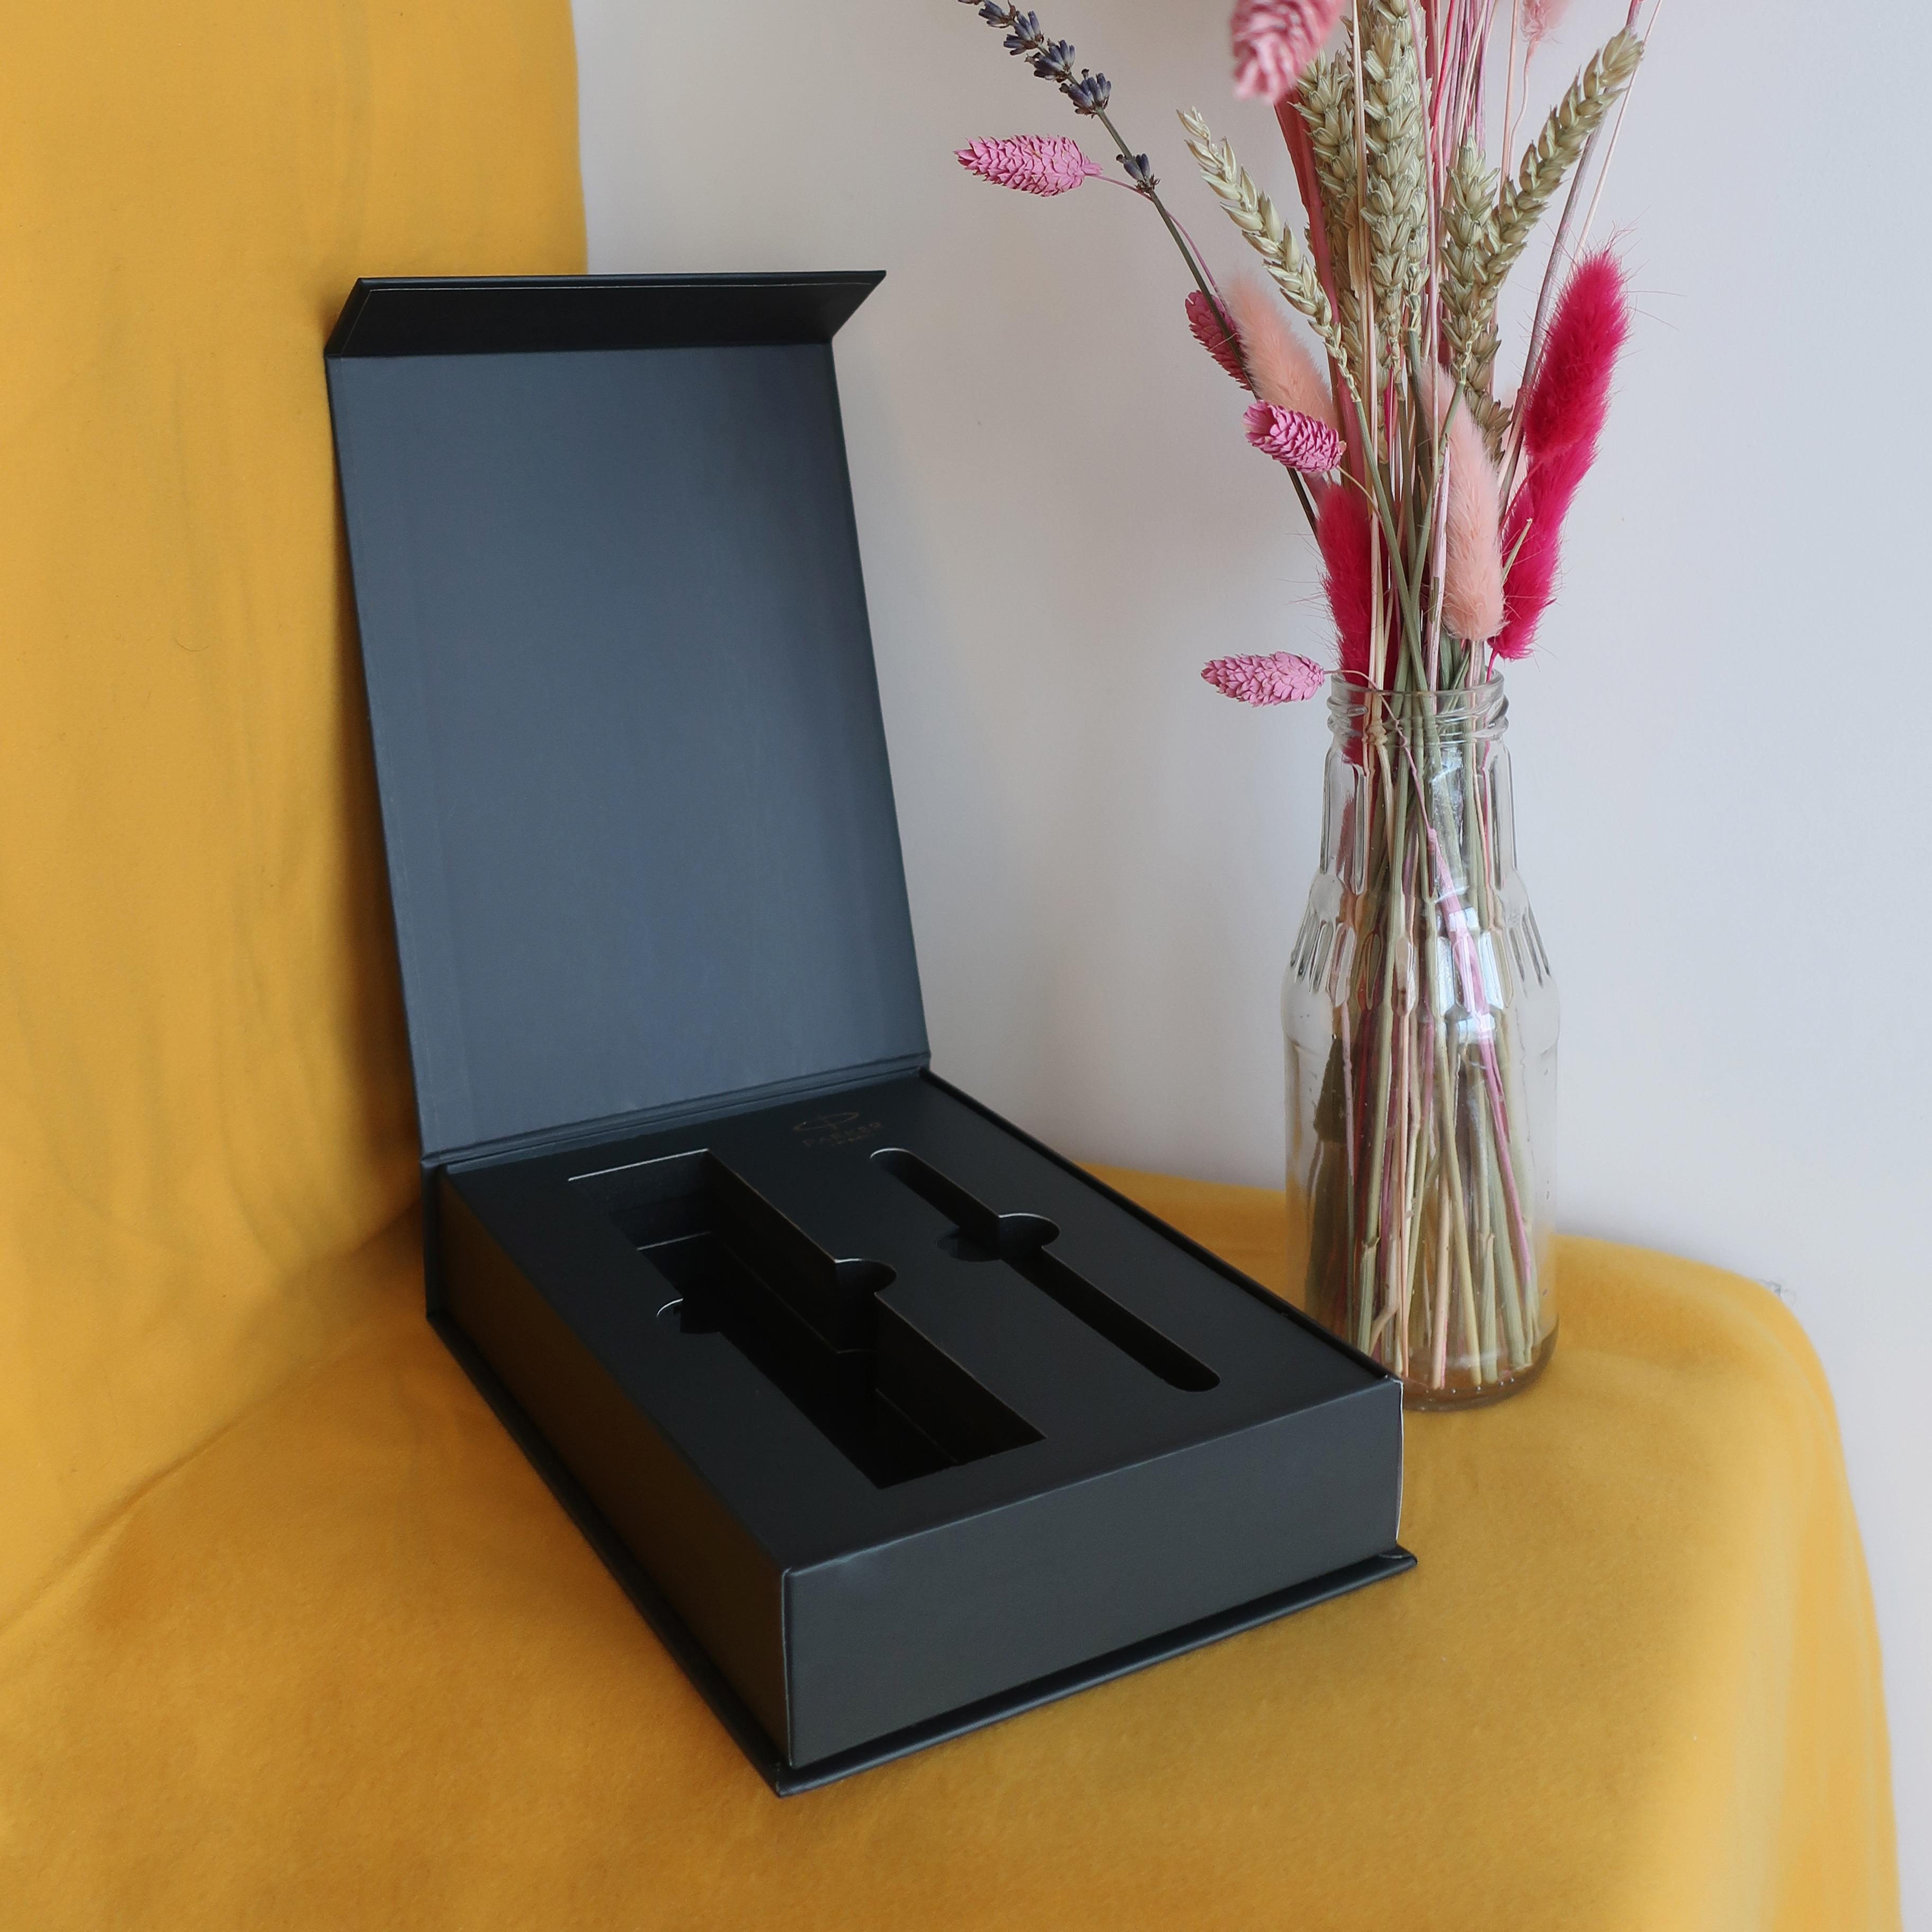 Образец коробочки с ложементом из картона